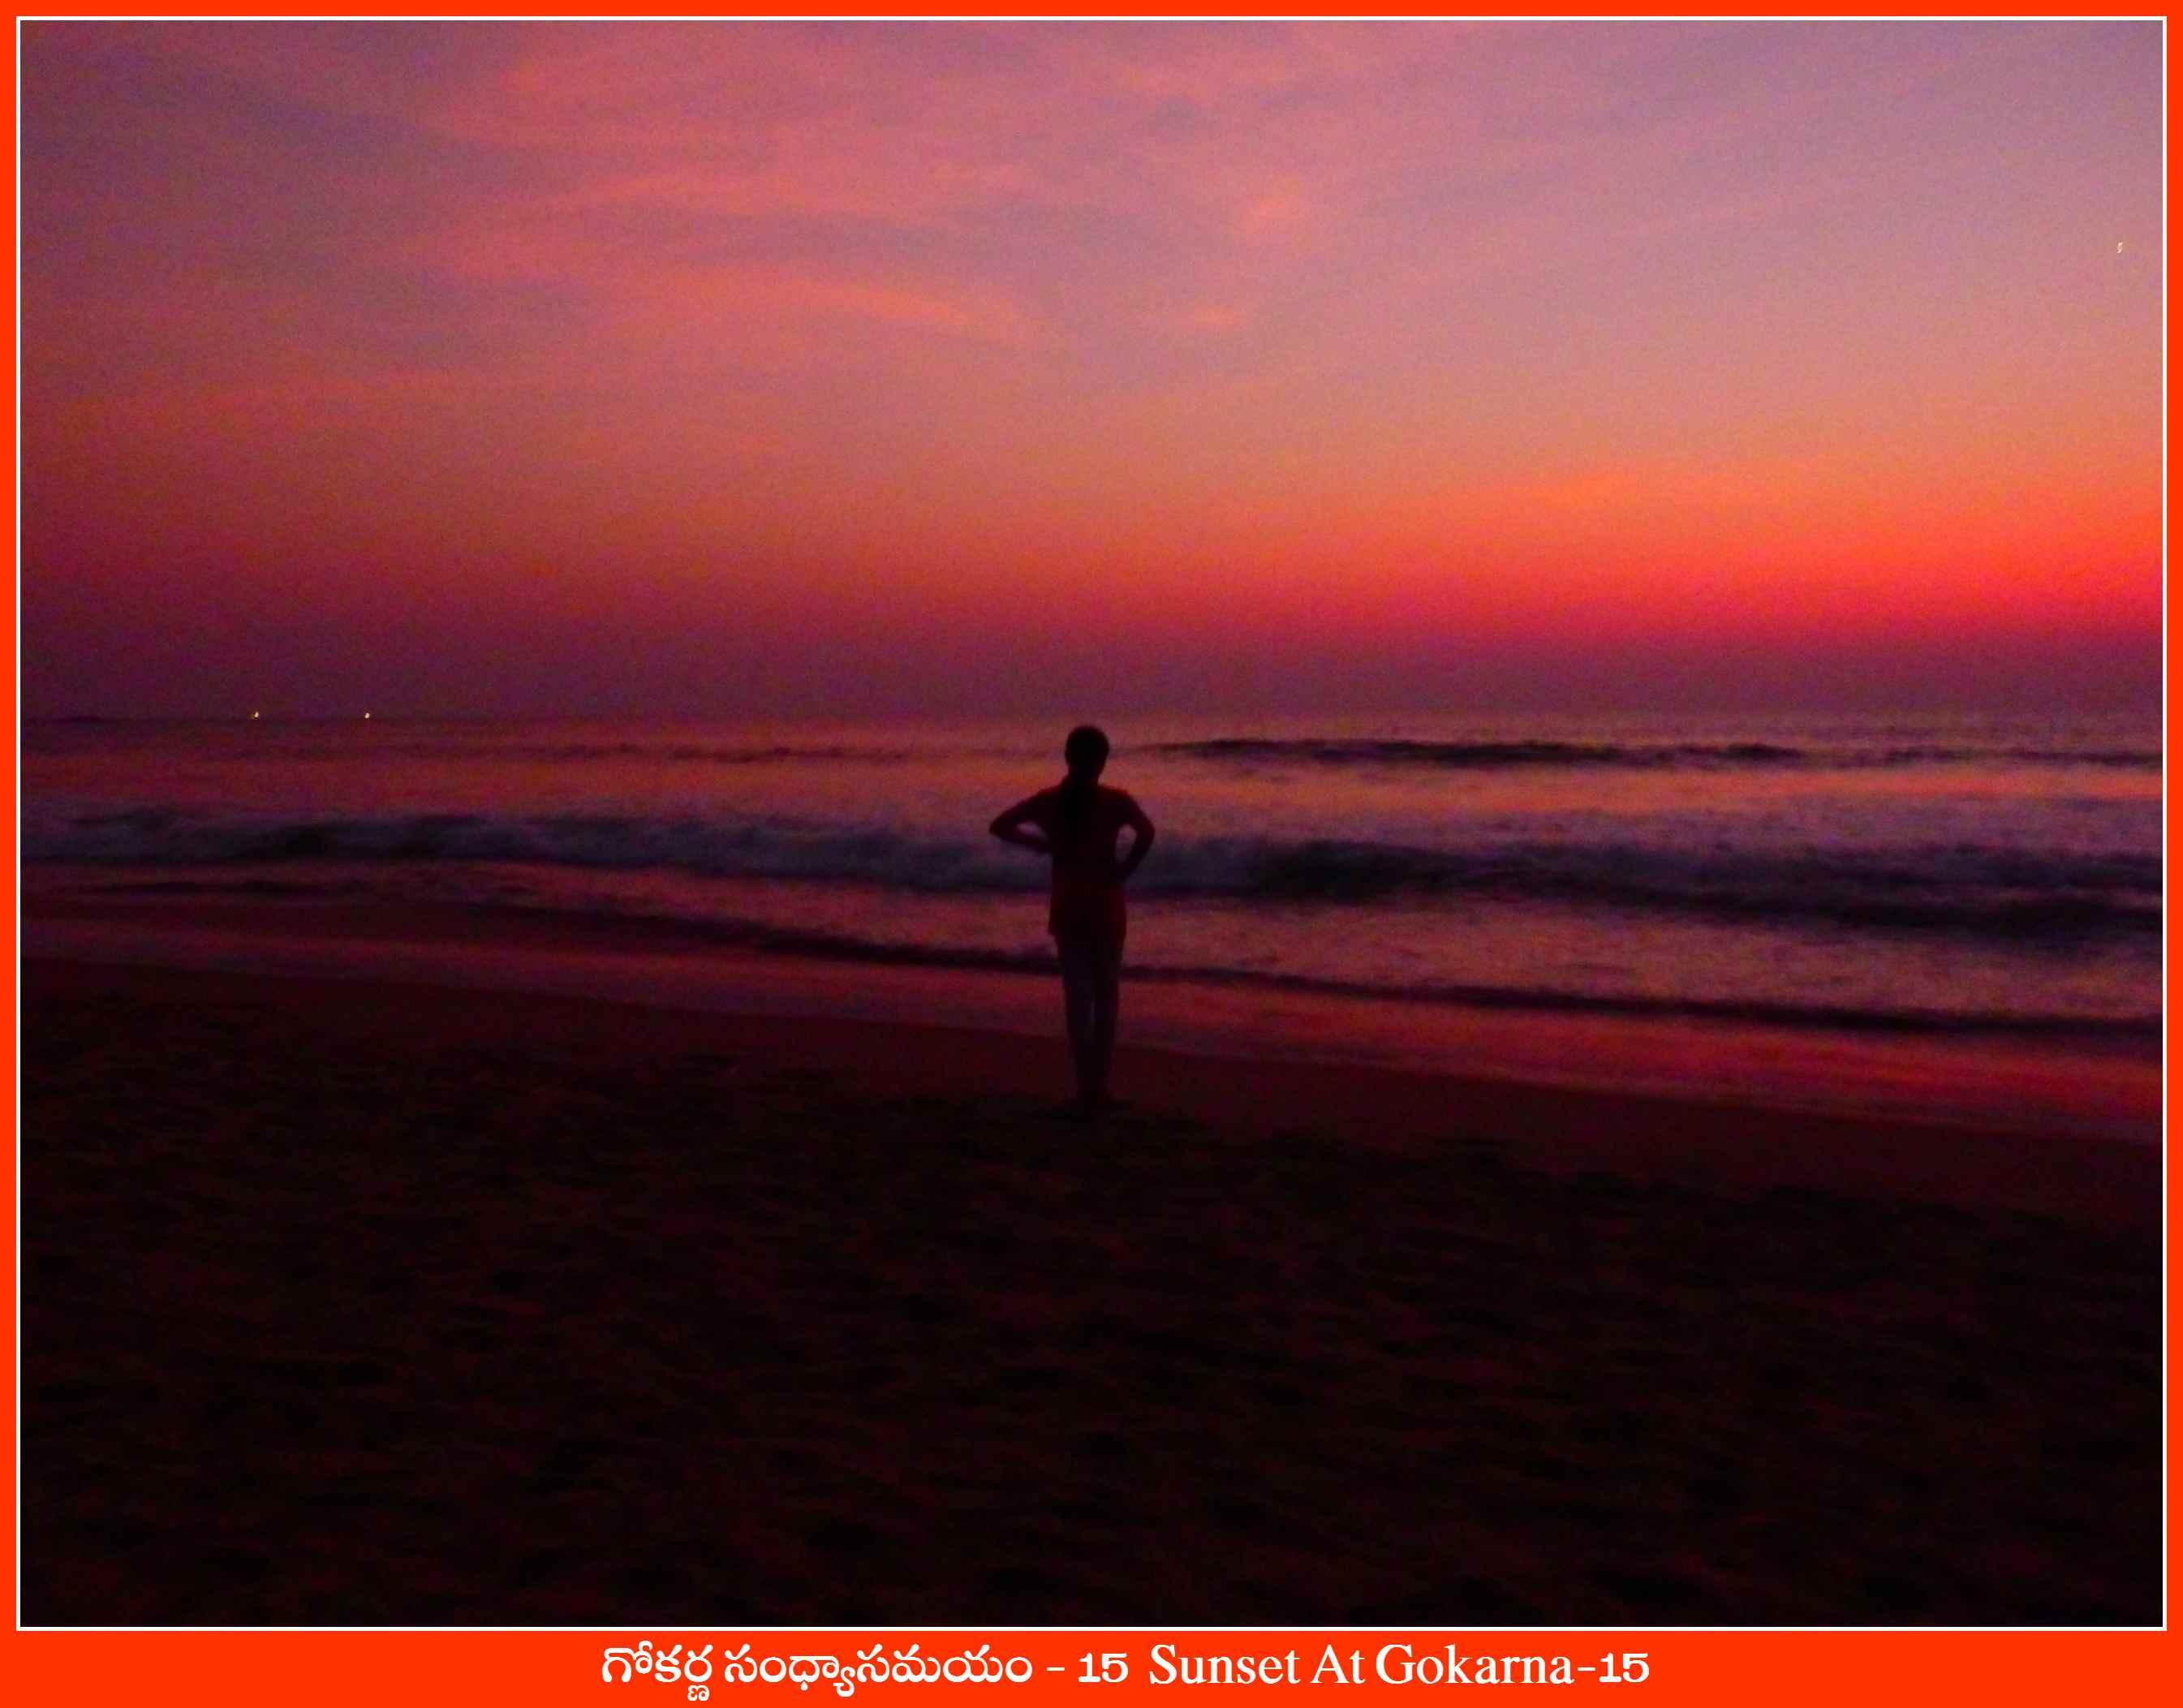 Sunset At Gokarna-15